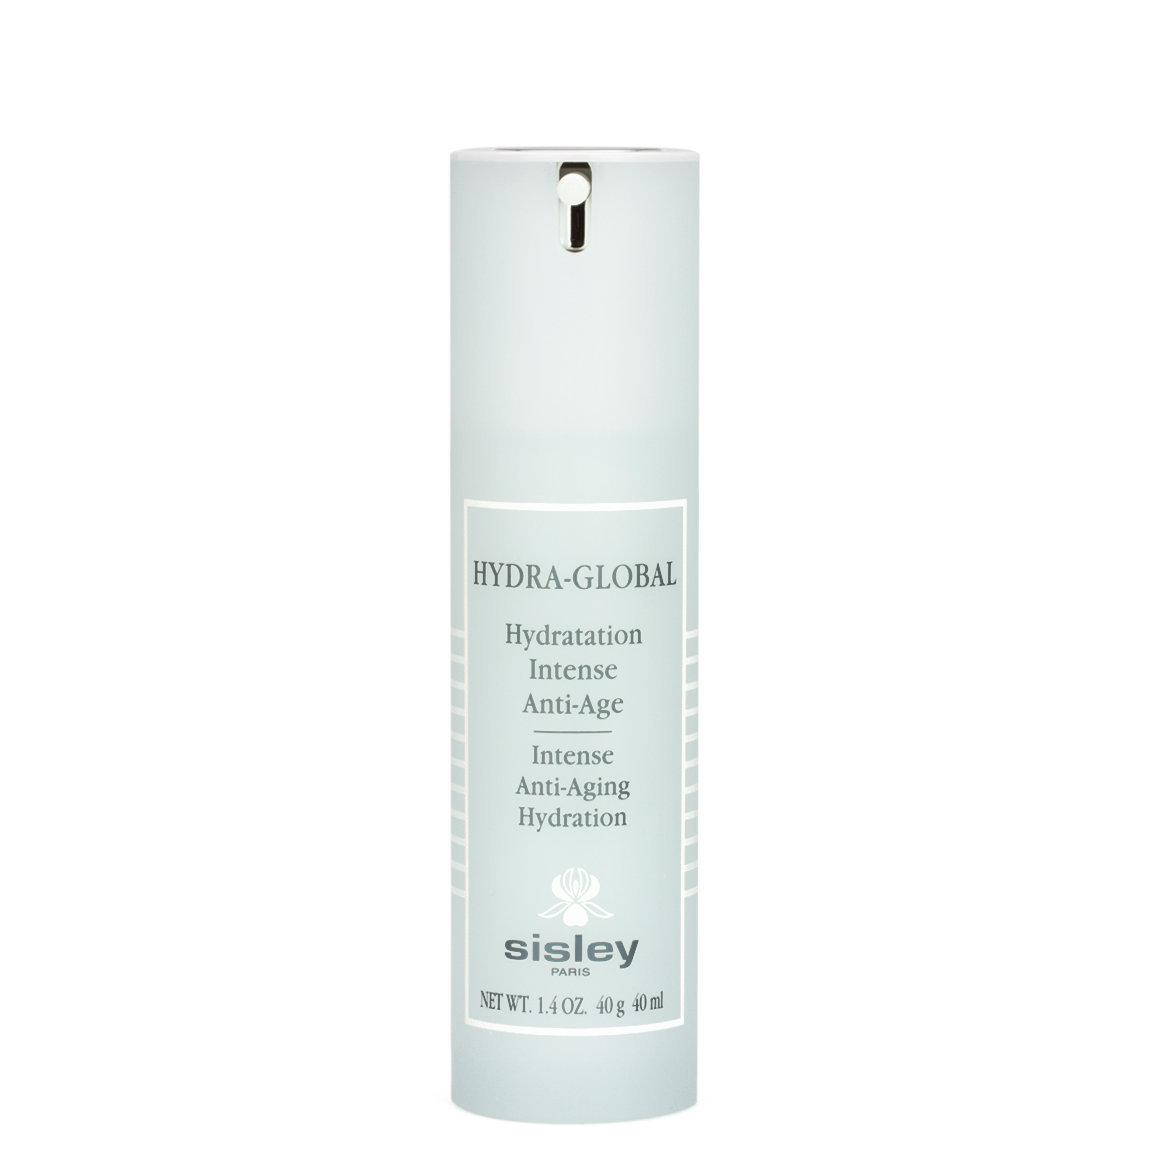 Sisley-Paris Hydra-Global Intense Anti-Aging Hydration alternative view 1 - product swatch.